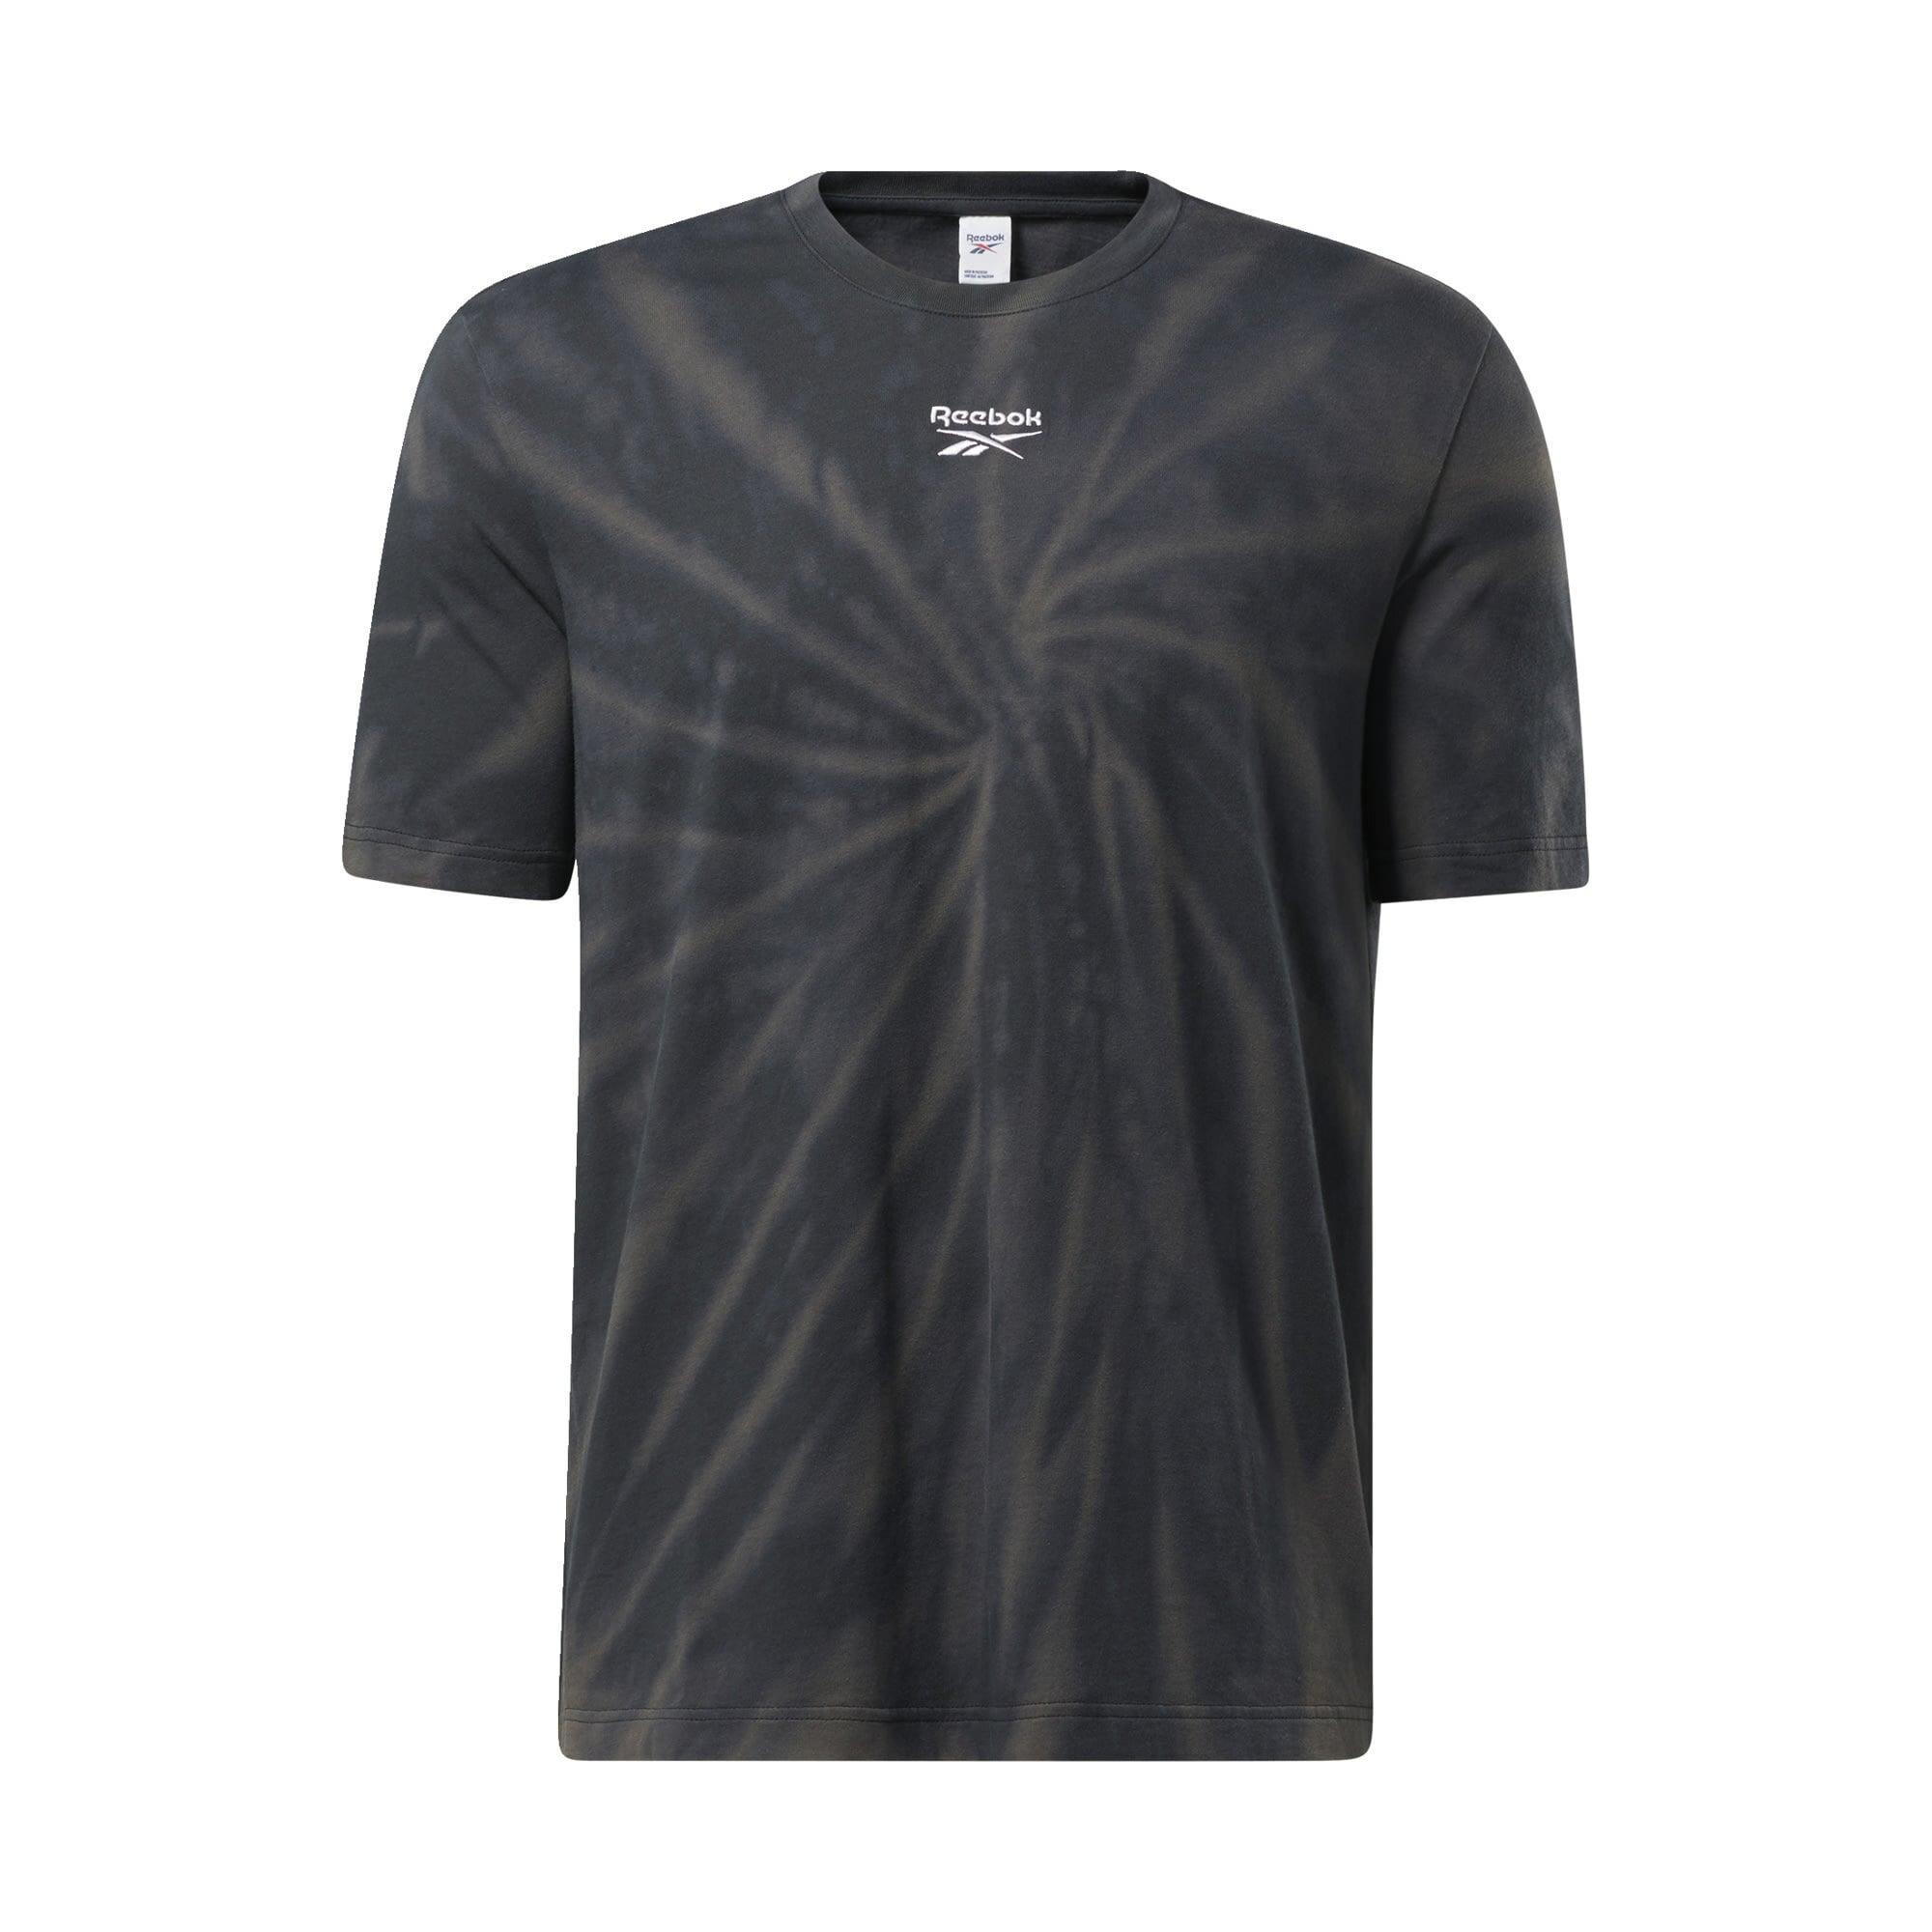 Reebok Classic Marškinėliai bazalto pilka